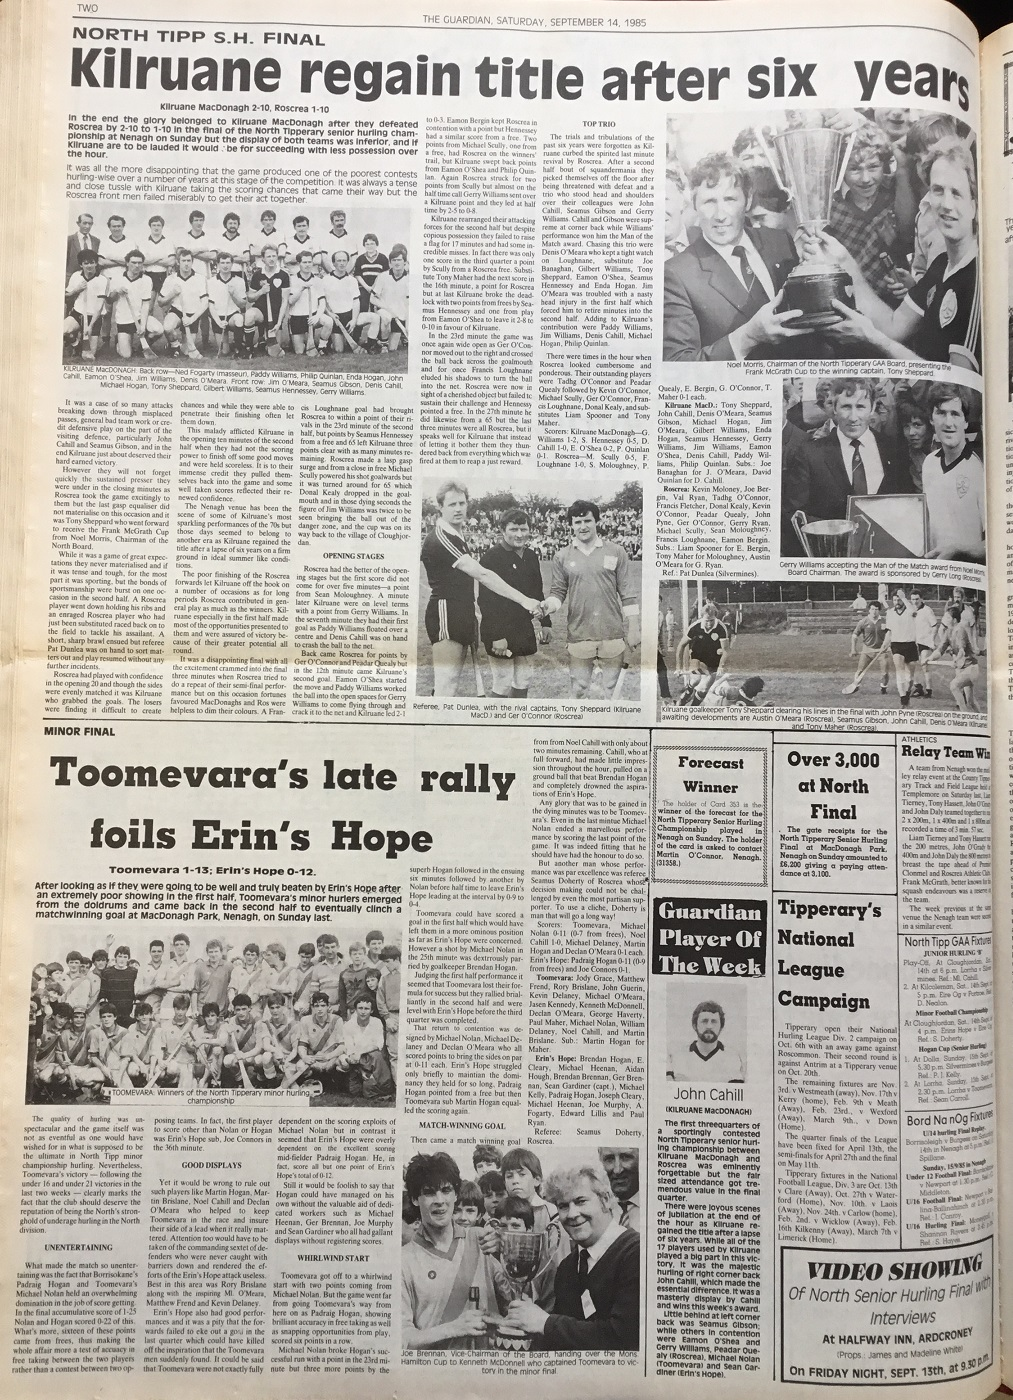 1985 North hurling final